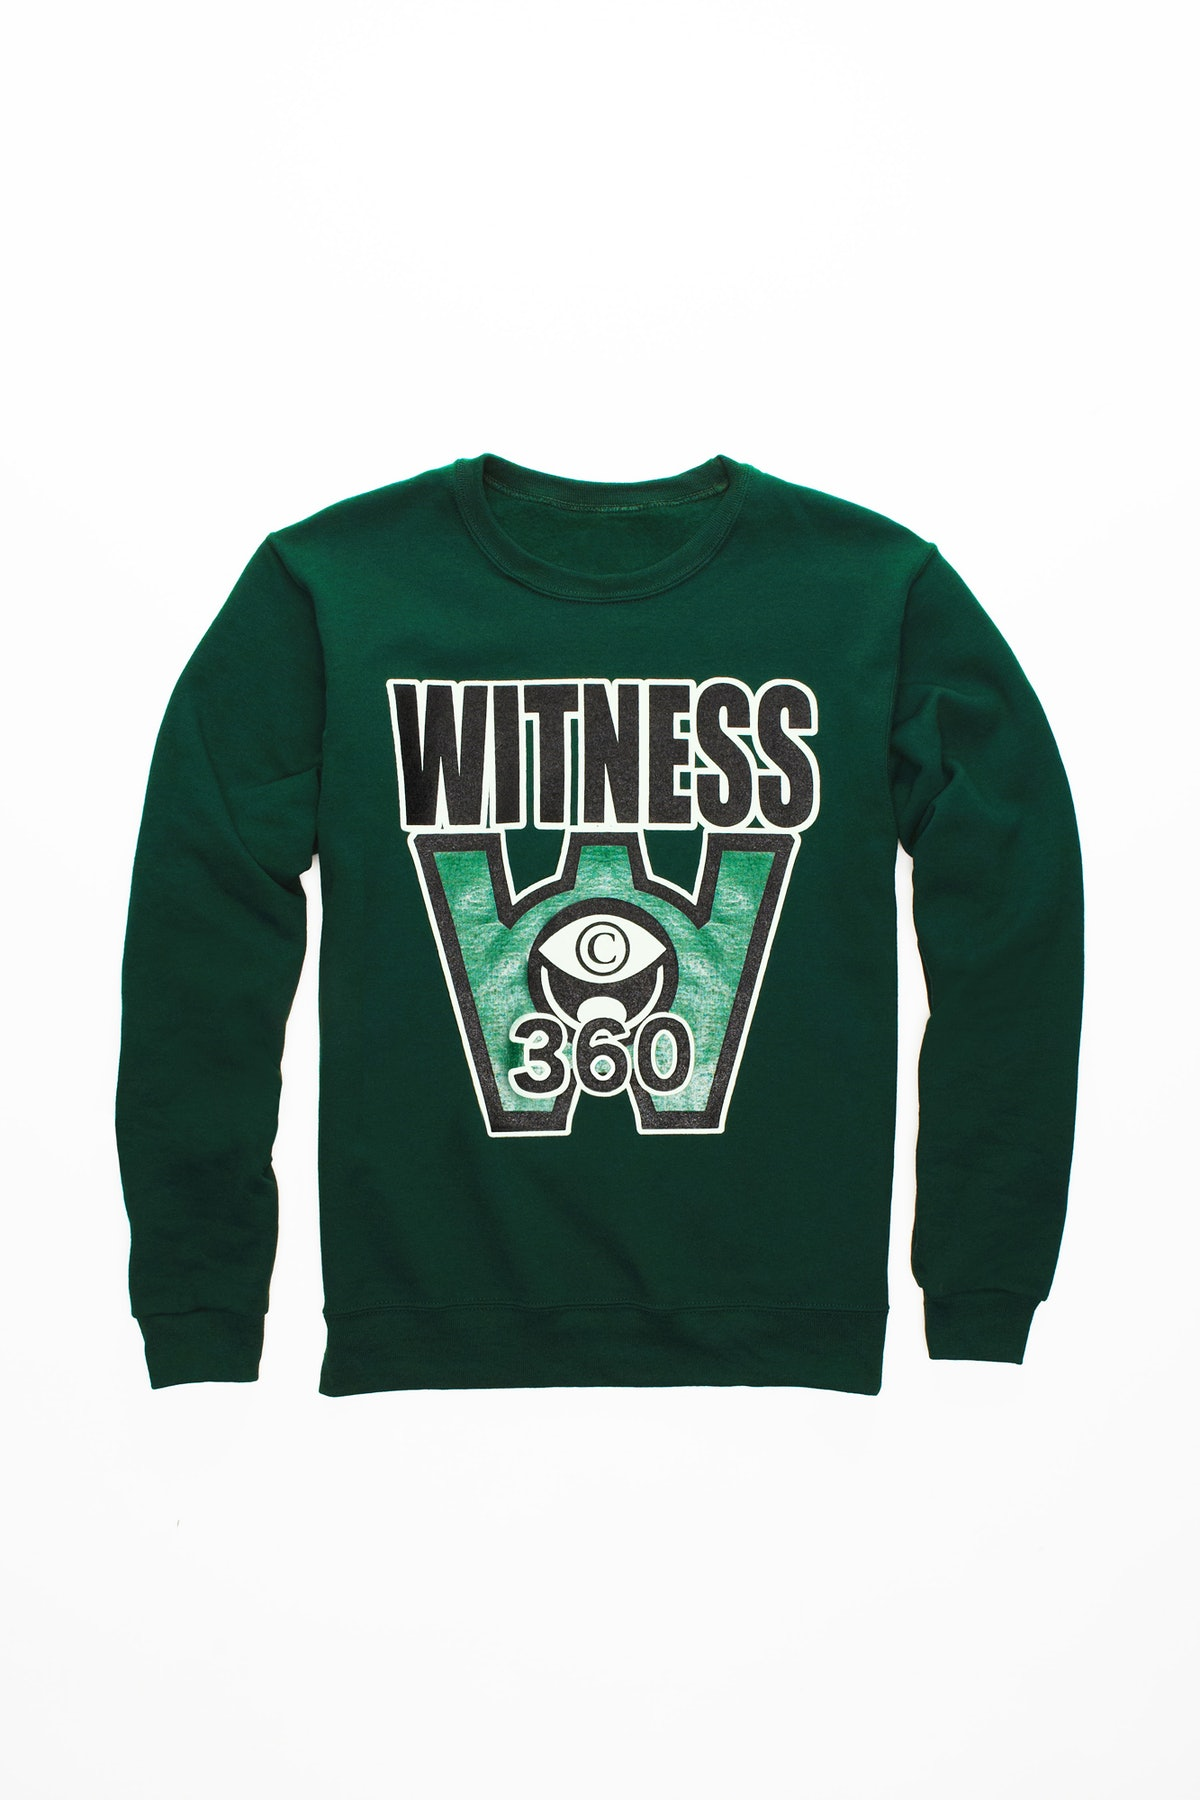 Ryan Trecartin's sweatshirts